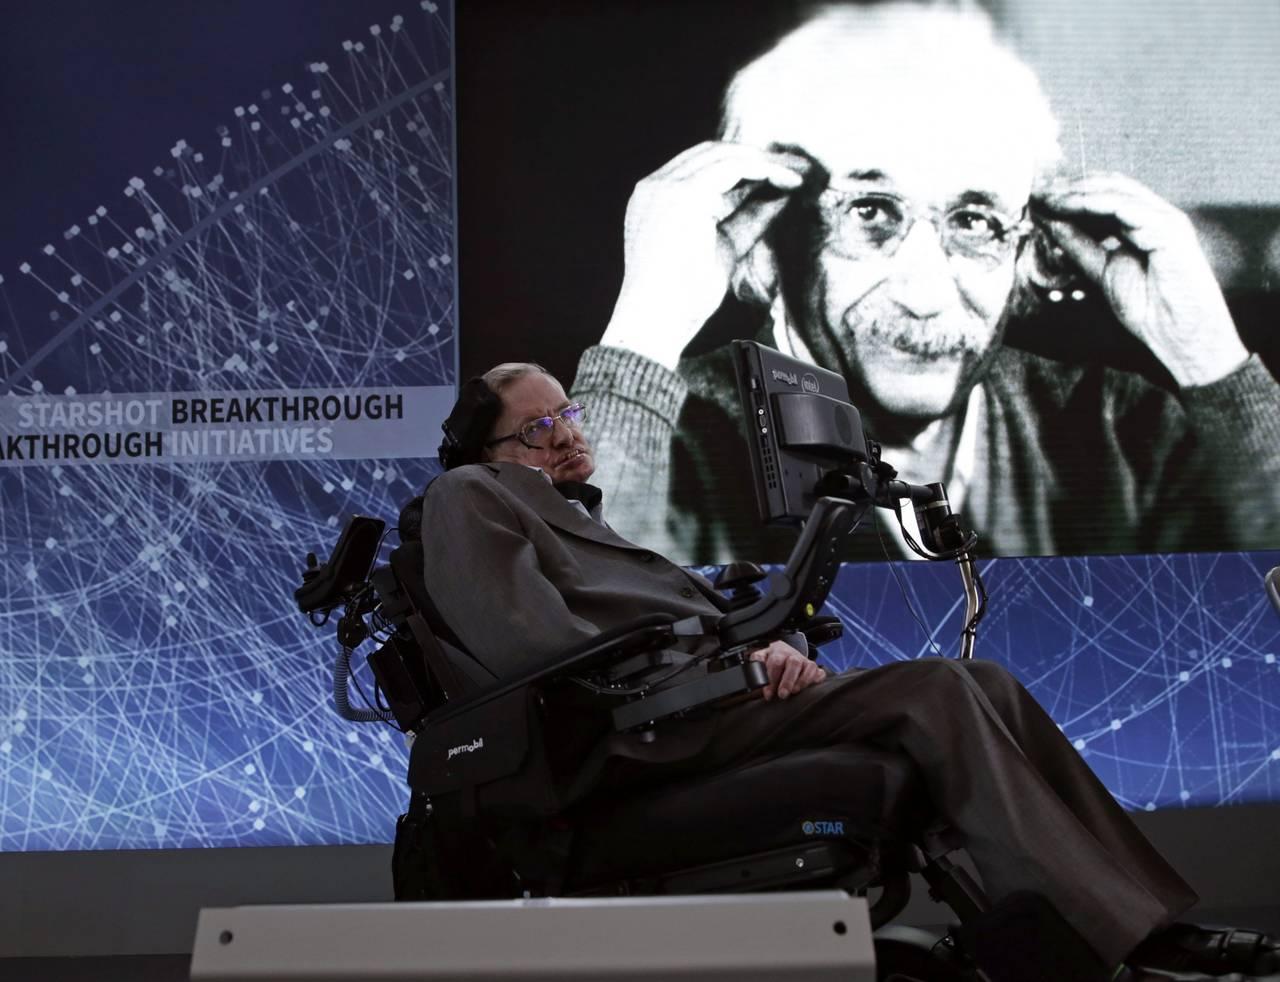 Deja de existir Hawking y se vuelve universal